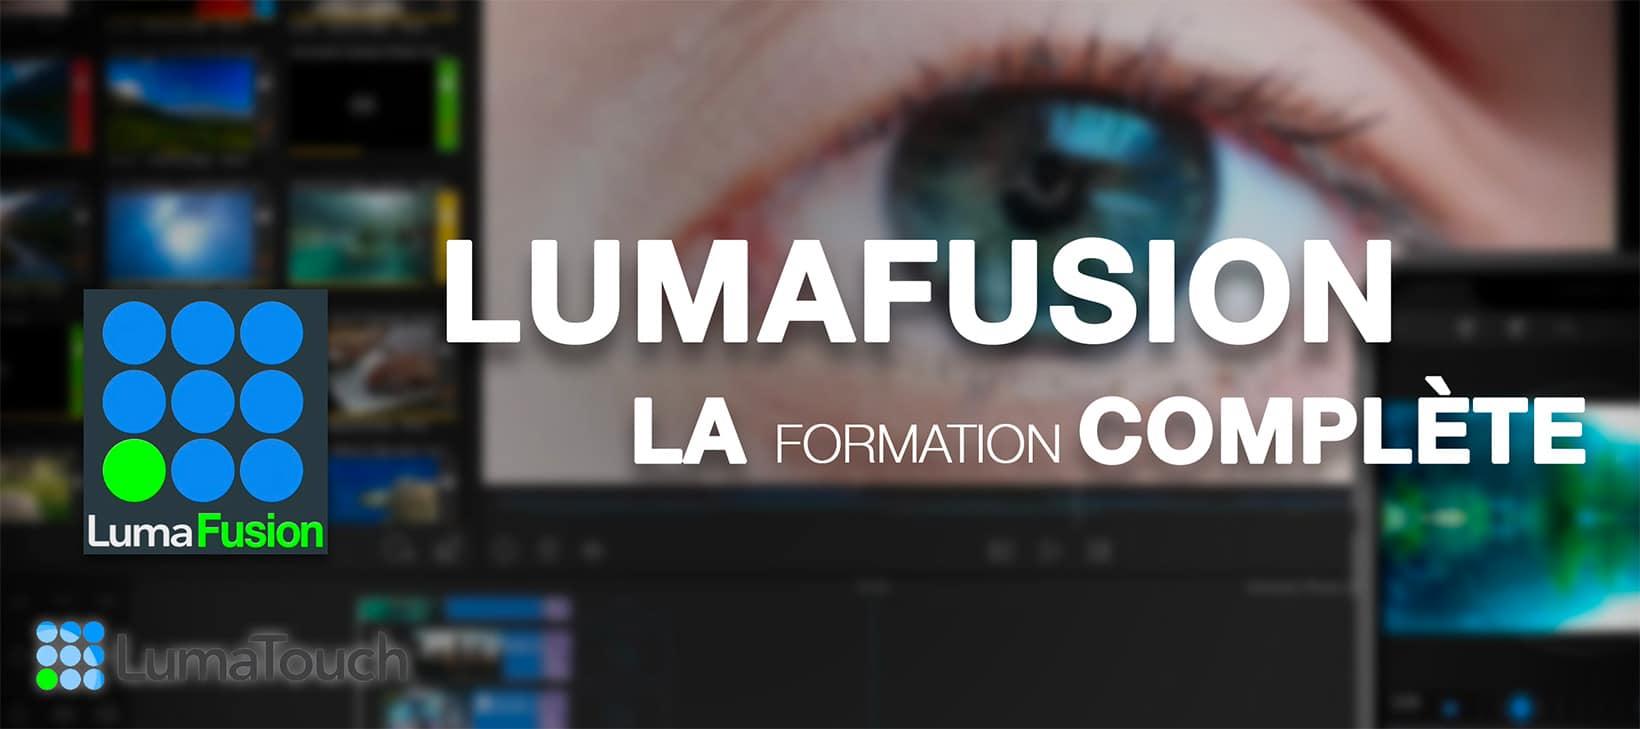 visuel formation complete lumafusion de lumatouch